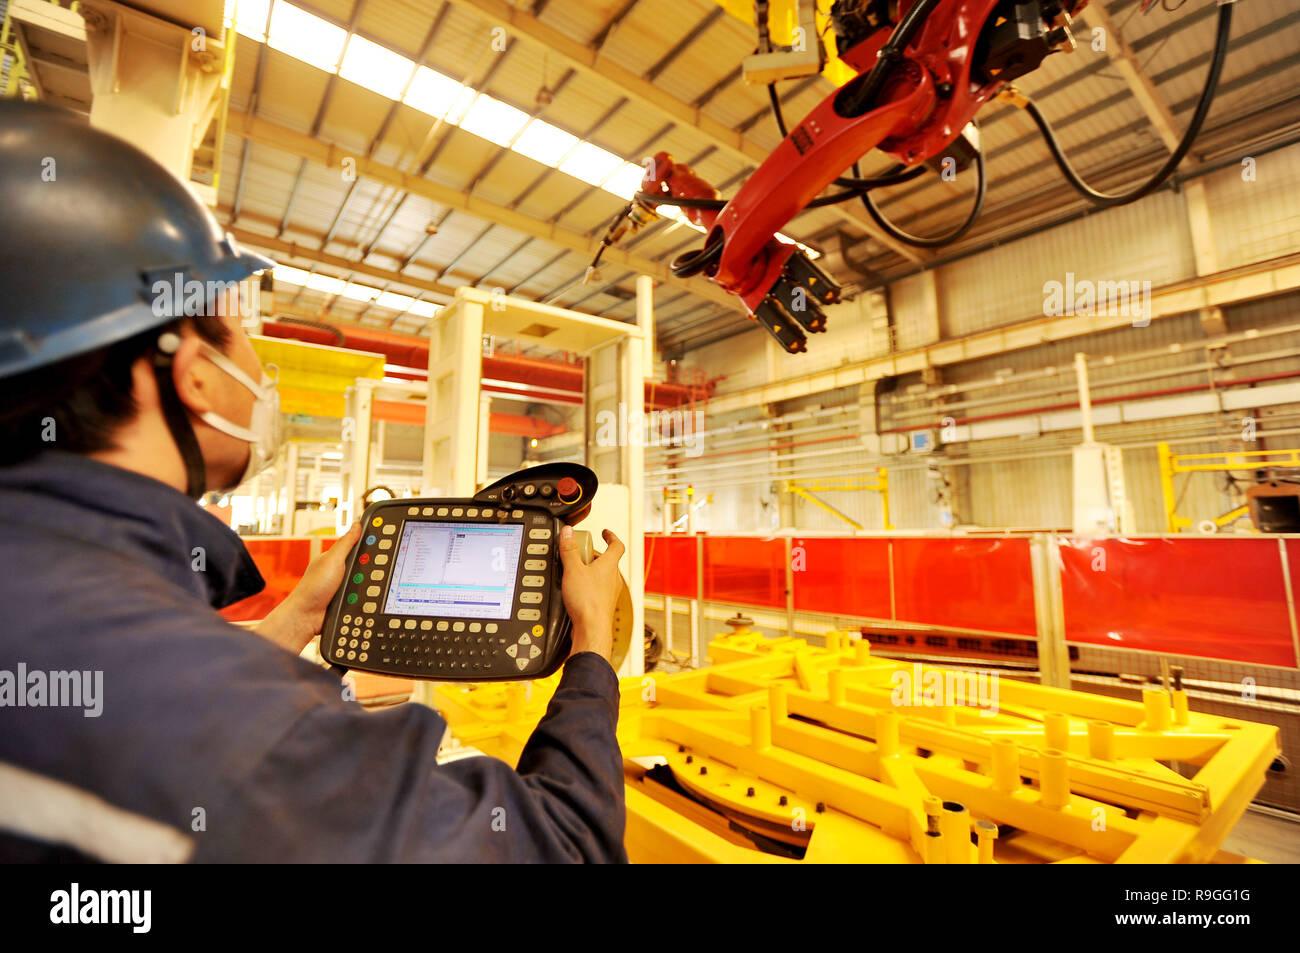 China Manufacturing Technology Stock Photos & China